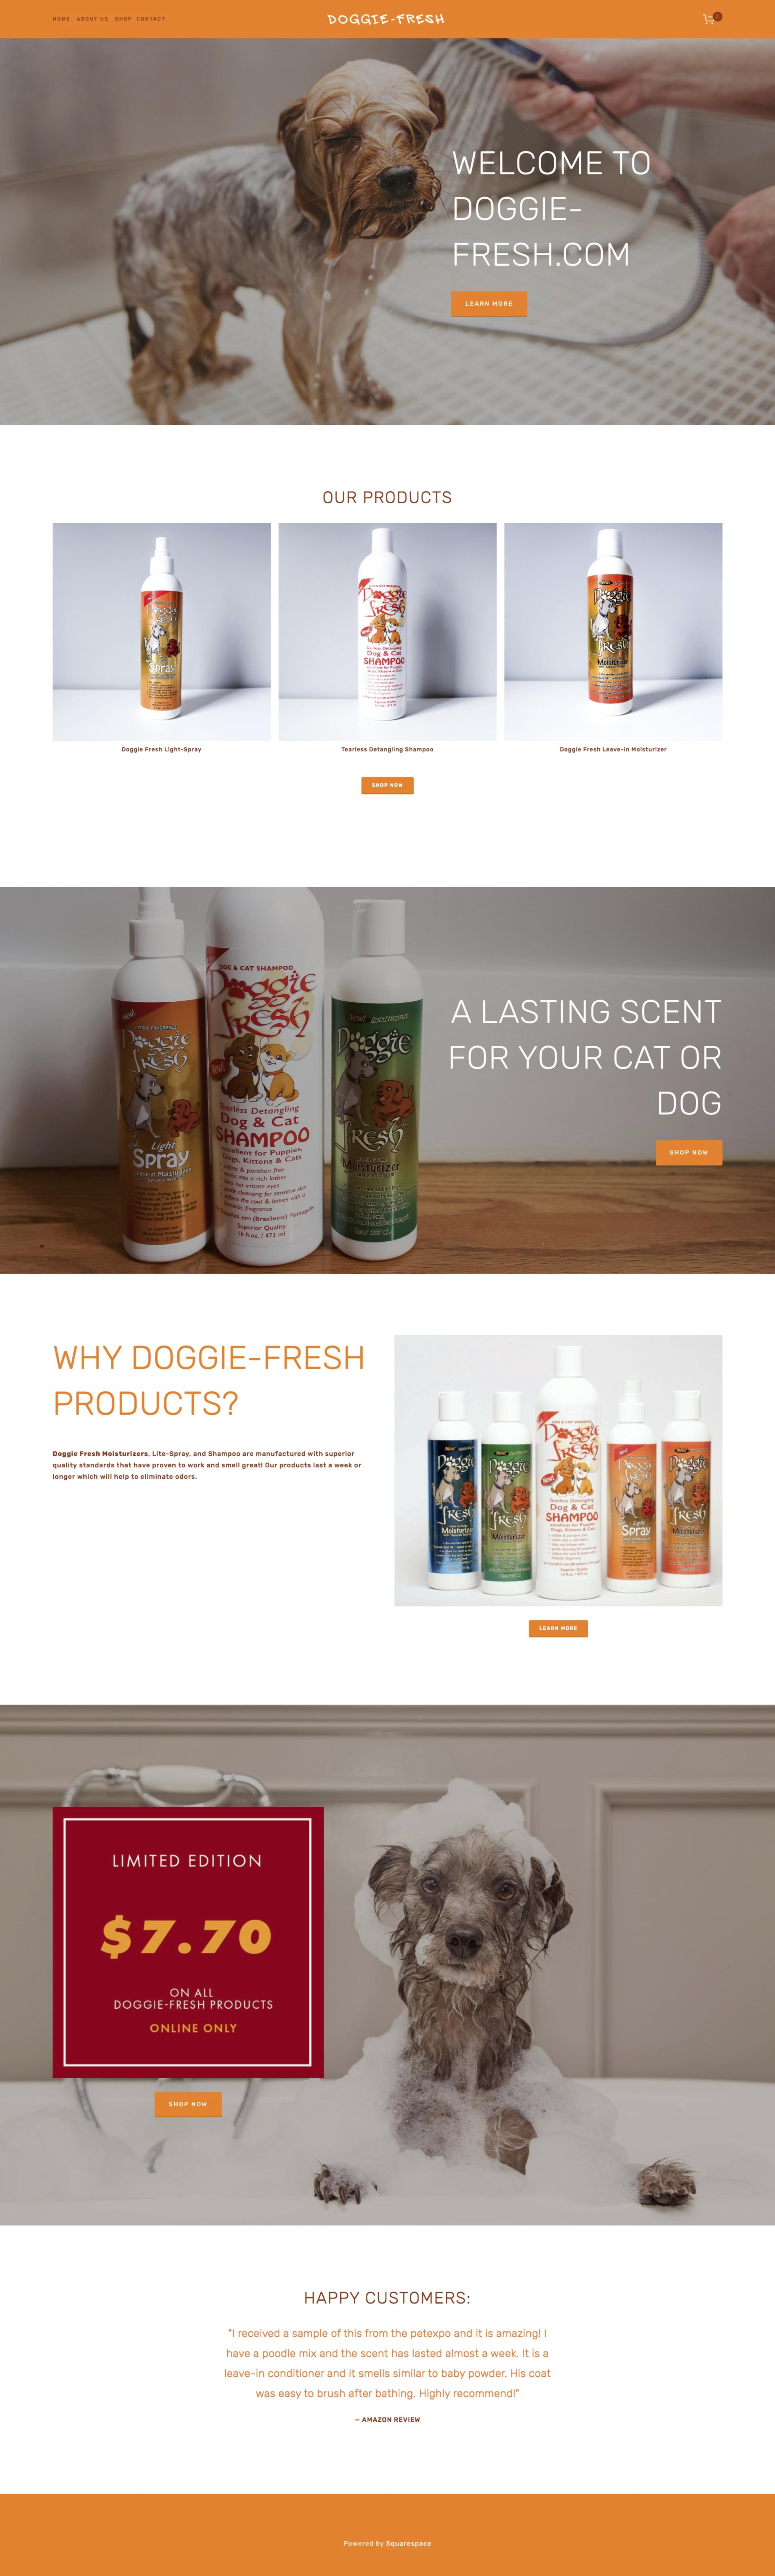 Doggie Fresh / Web Design